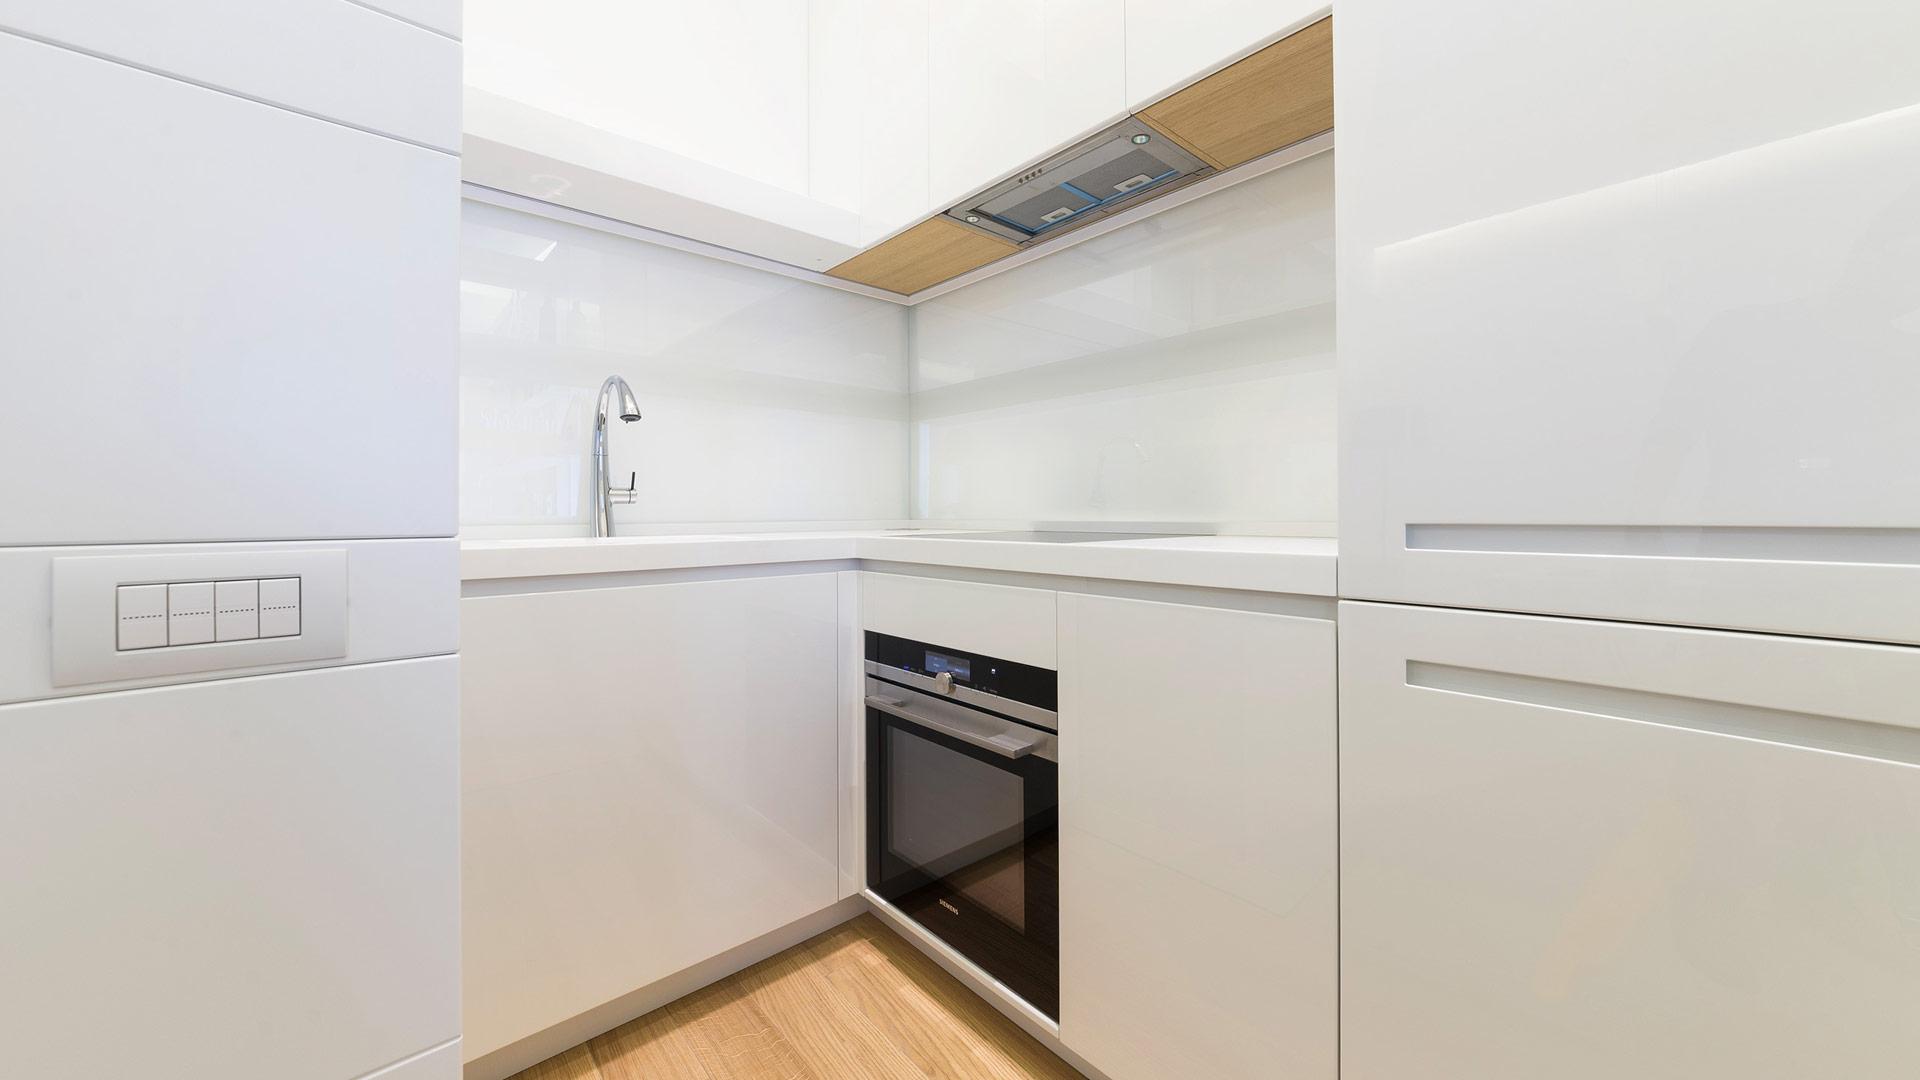 Interior: Private apartment in Rome with a simple, unique and functional design - TM Italia - Area-contract-Cicchetti-05